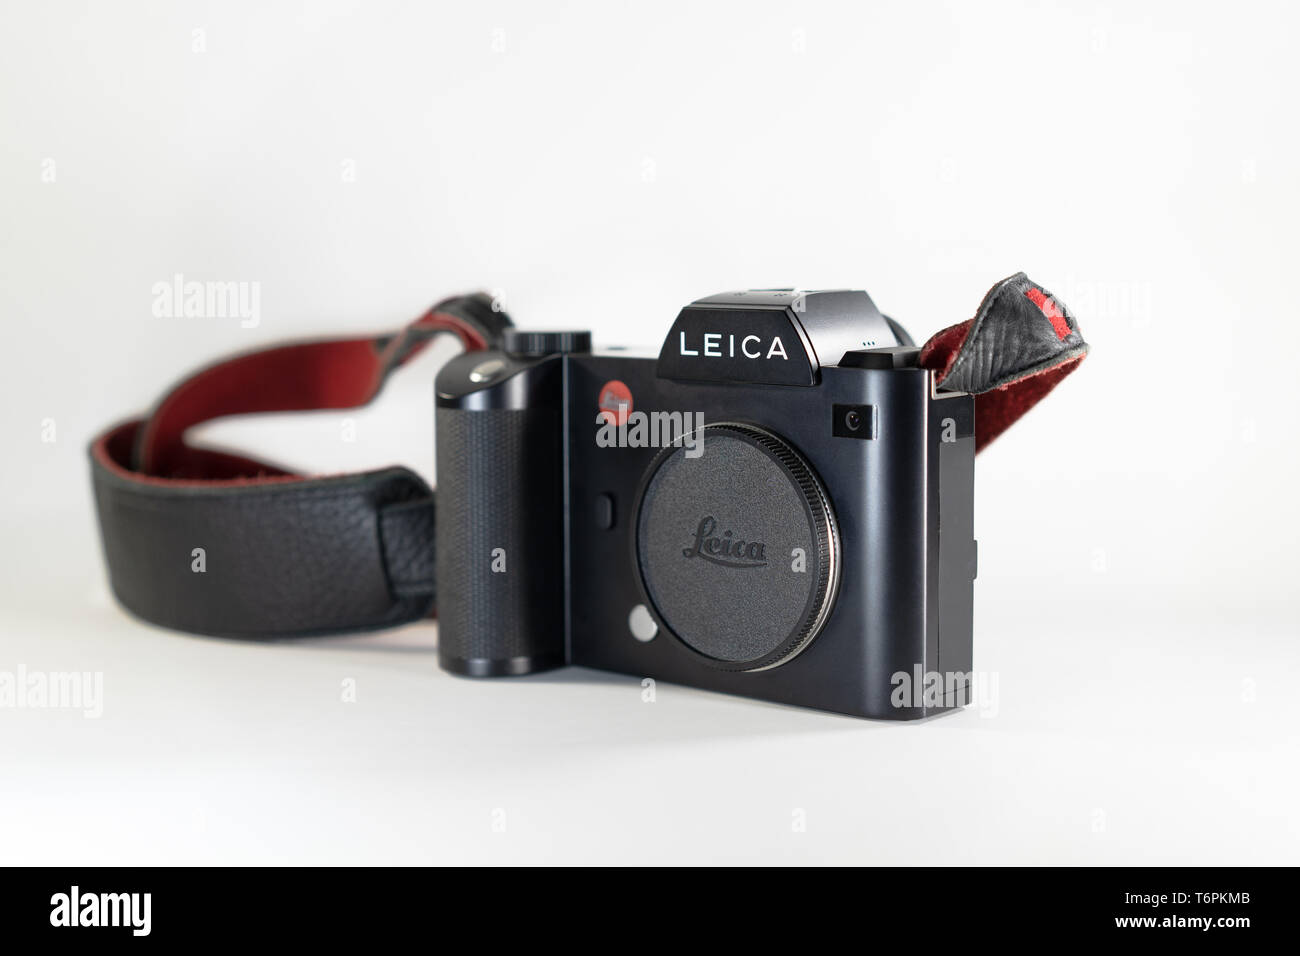 Bangkok, Thailand - 13 Jul, 2018: Leica SL; the professional mirrorless fullframe camera 35mm CMOS Sensor by Leica Germany from 2015 in name Leica SL. - Stock Image